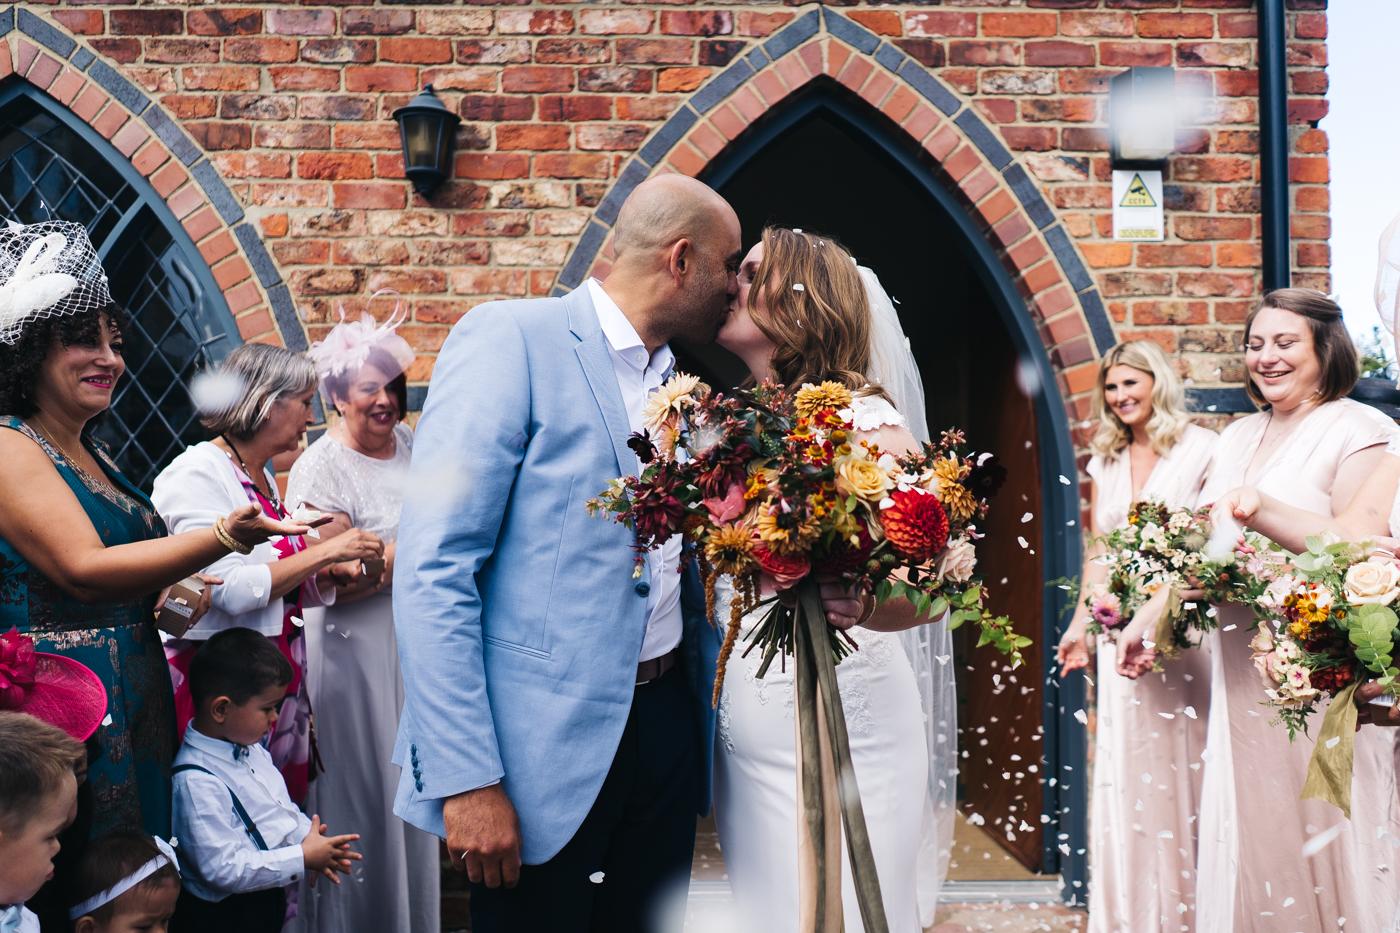 wedding-at-the-pheasant-harome-helmsley-north-yorkshire-wedding-photographer-0020.jpg